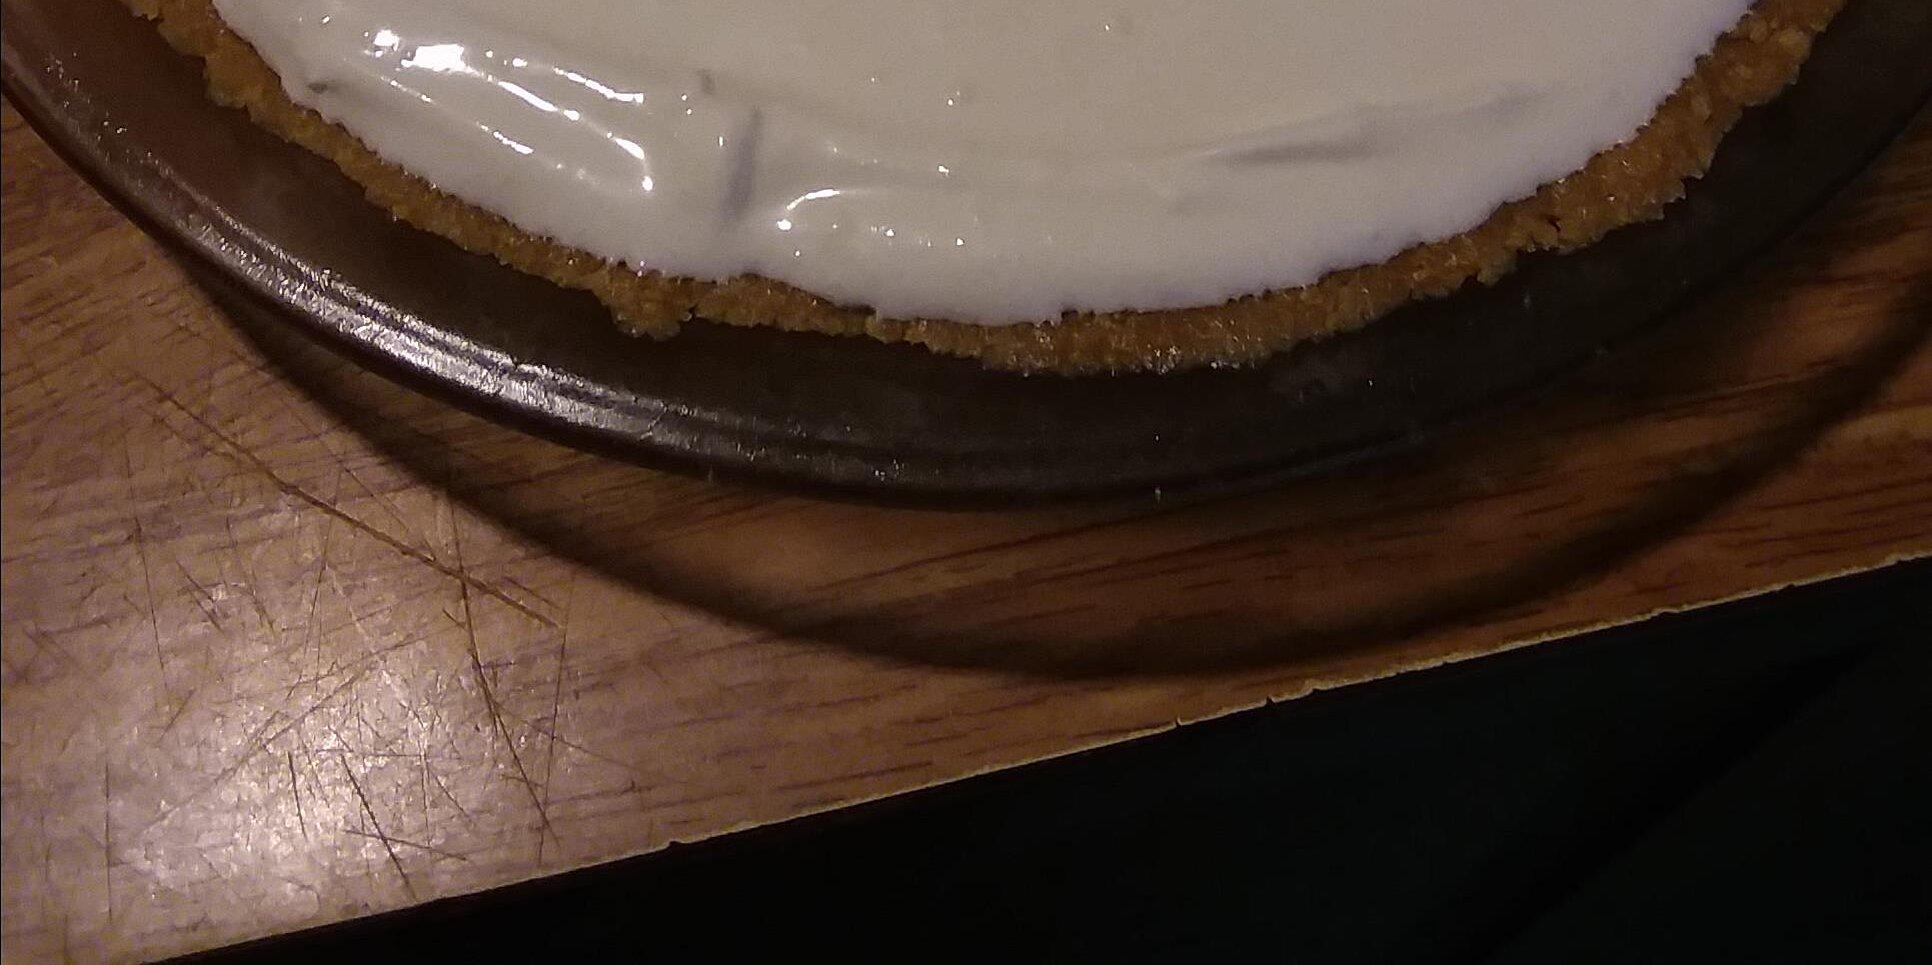 grandmas no bake cheesecake recipe